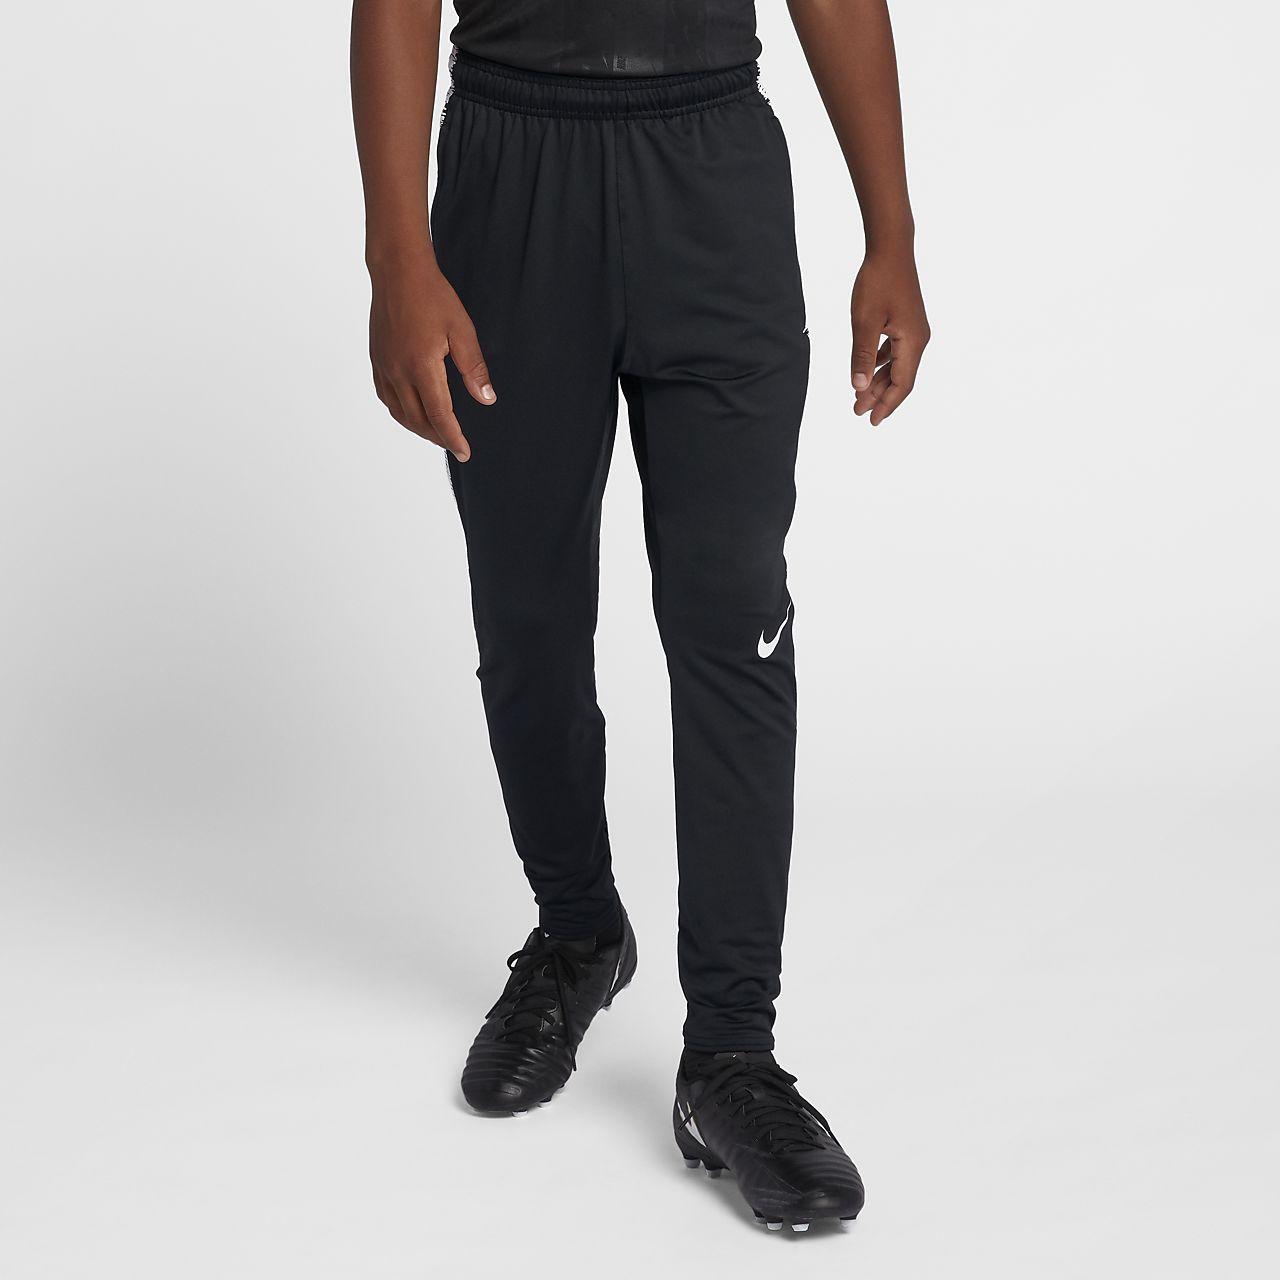 Fit Nike Da Ch Calcio Ragazzo Dri Squad Pantaloni EqHUwI8w